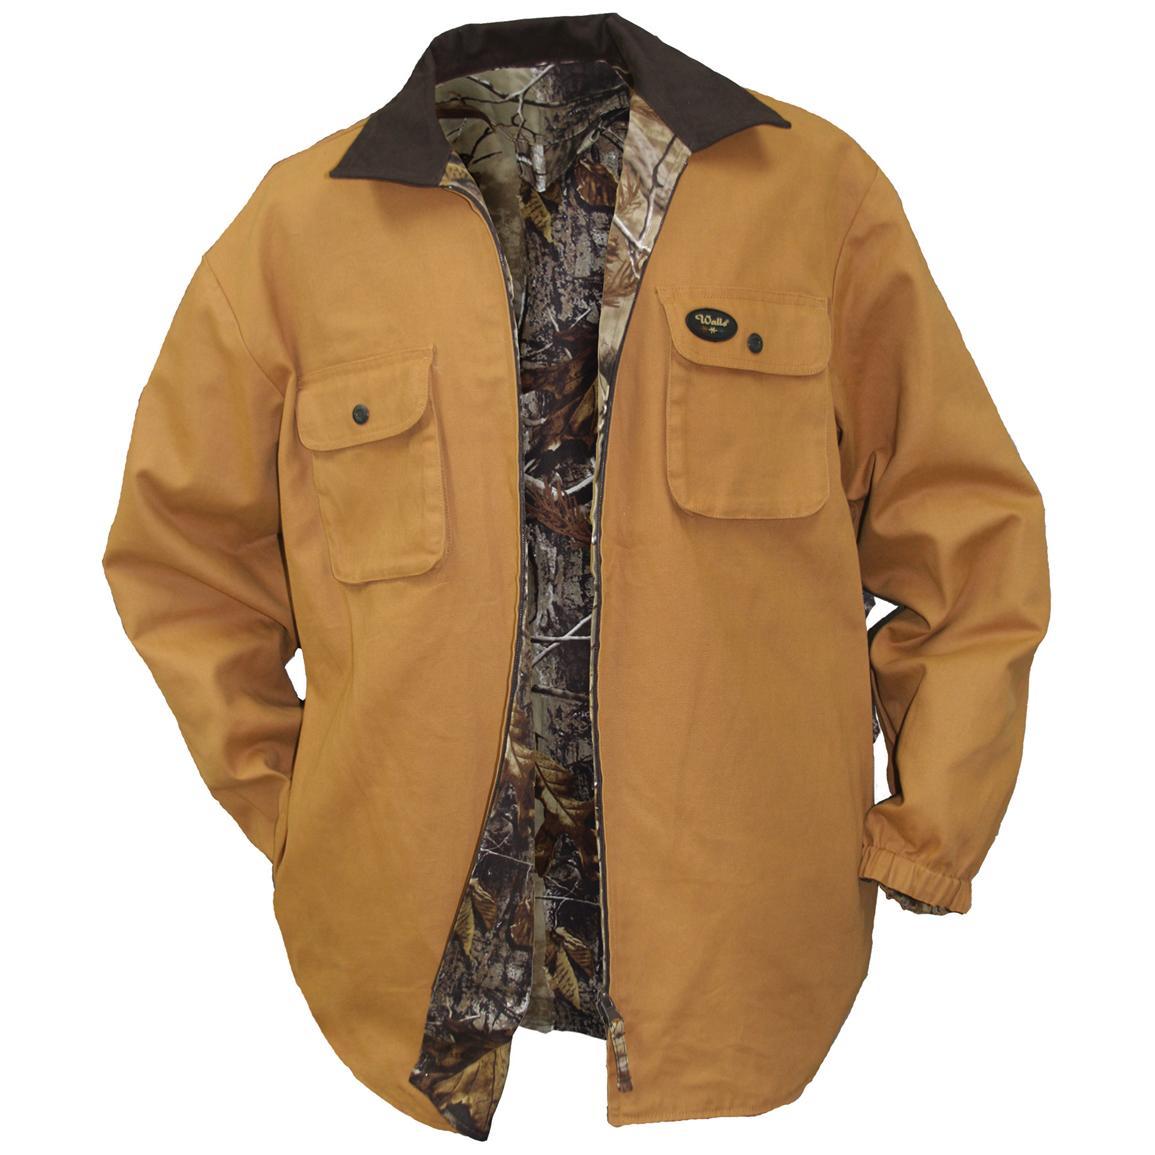 Flannel Motorcycle Jacket >> Shirt Jackets – Jackets